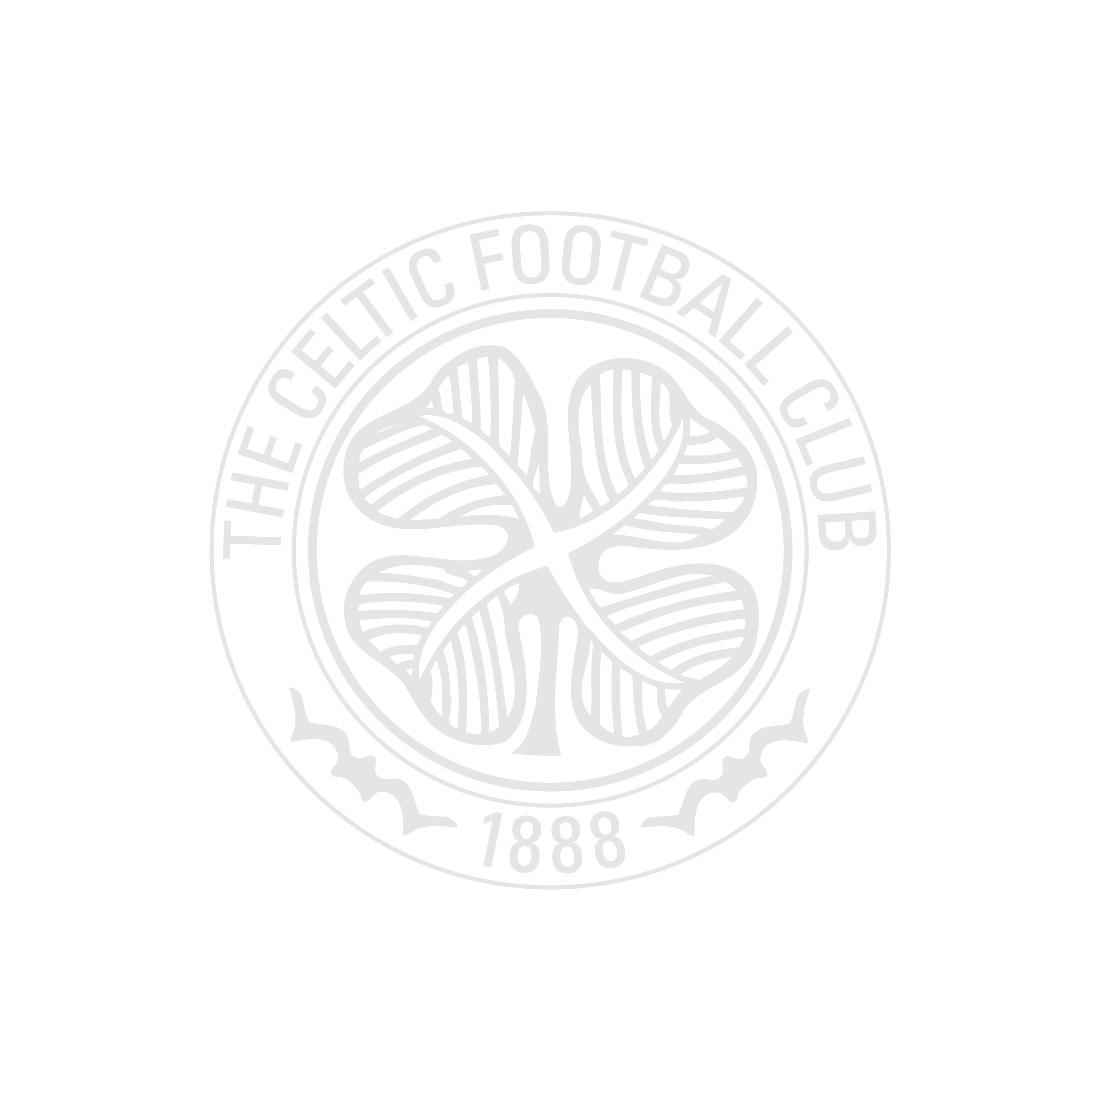 Celtic Mens Home Shirt 19/20 with Sponsor Back